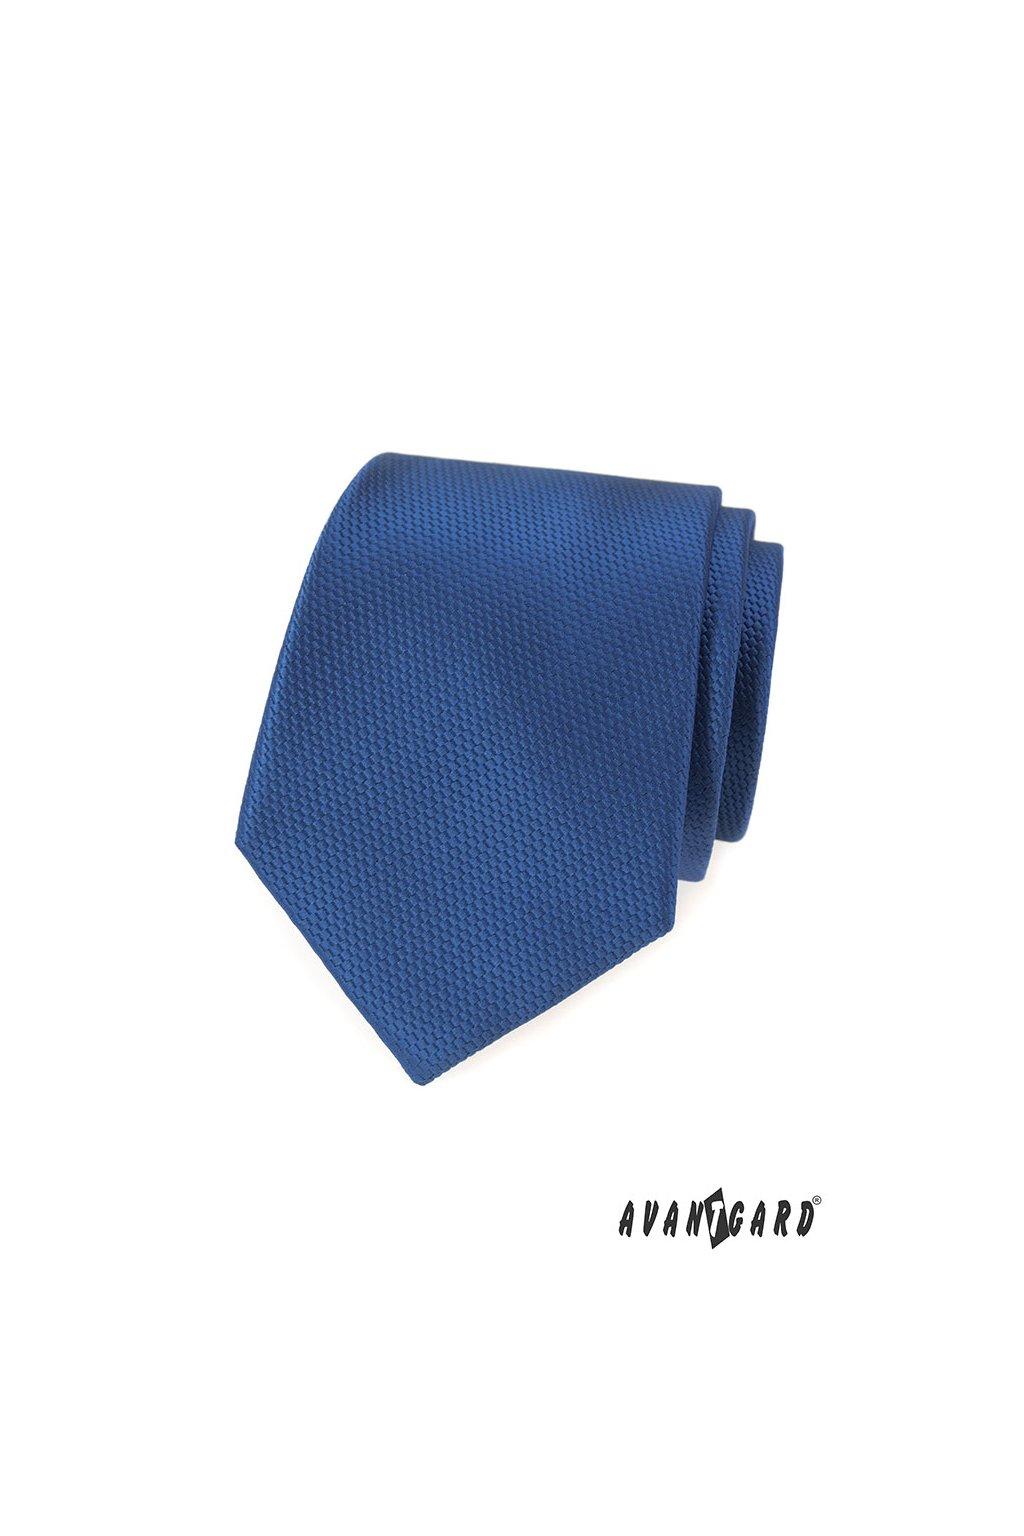 Kravata LUX modrá 561 - 14810